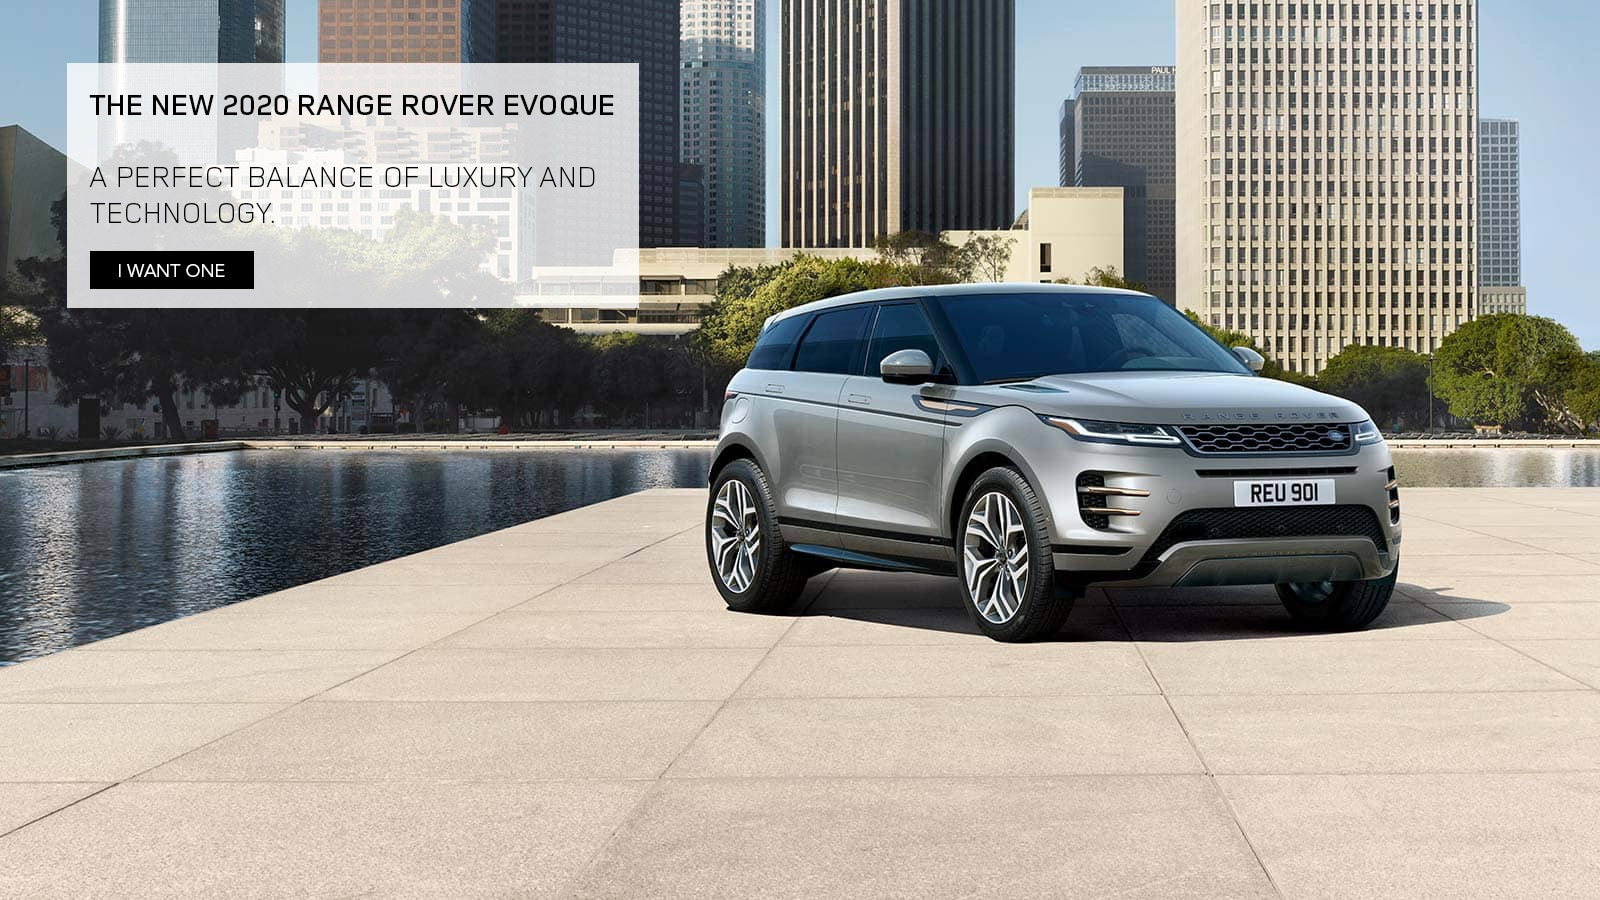 Range Rover San Diego >> The New 2020 Range Rover Evoque Land Rover San Diego